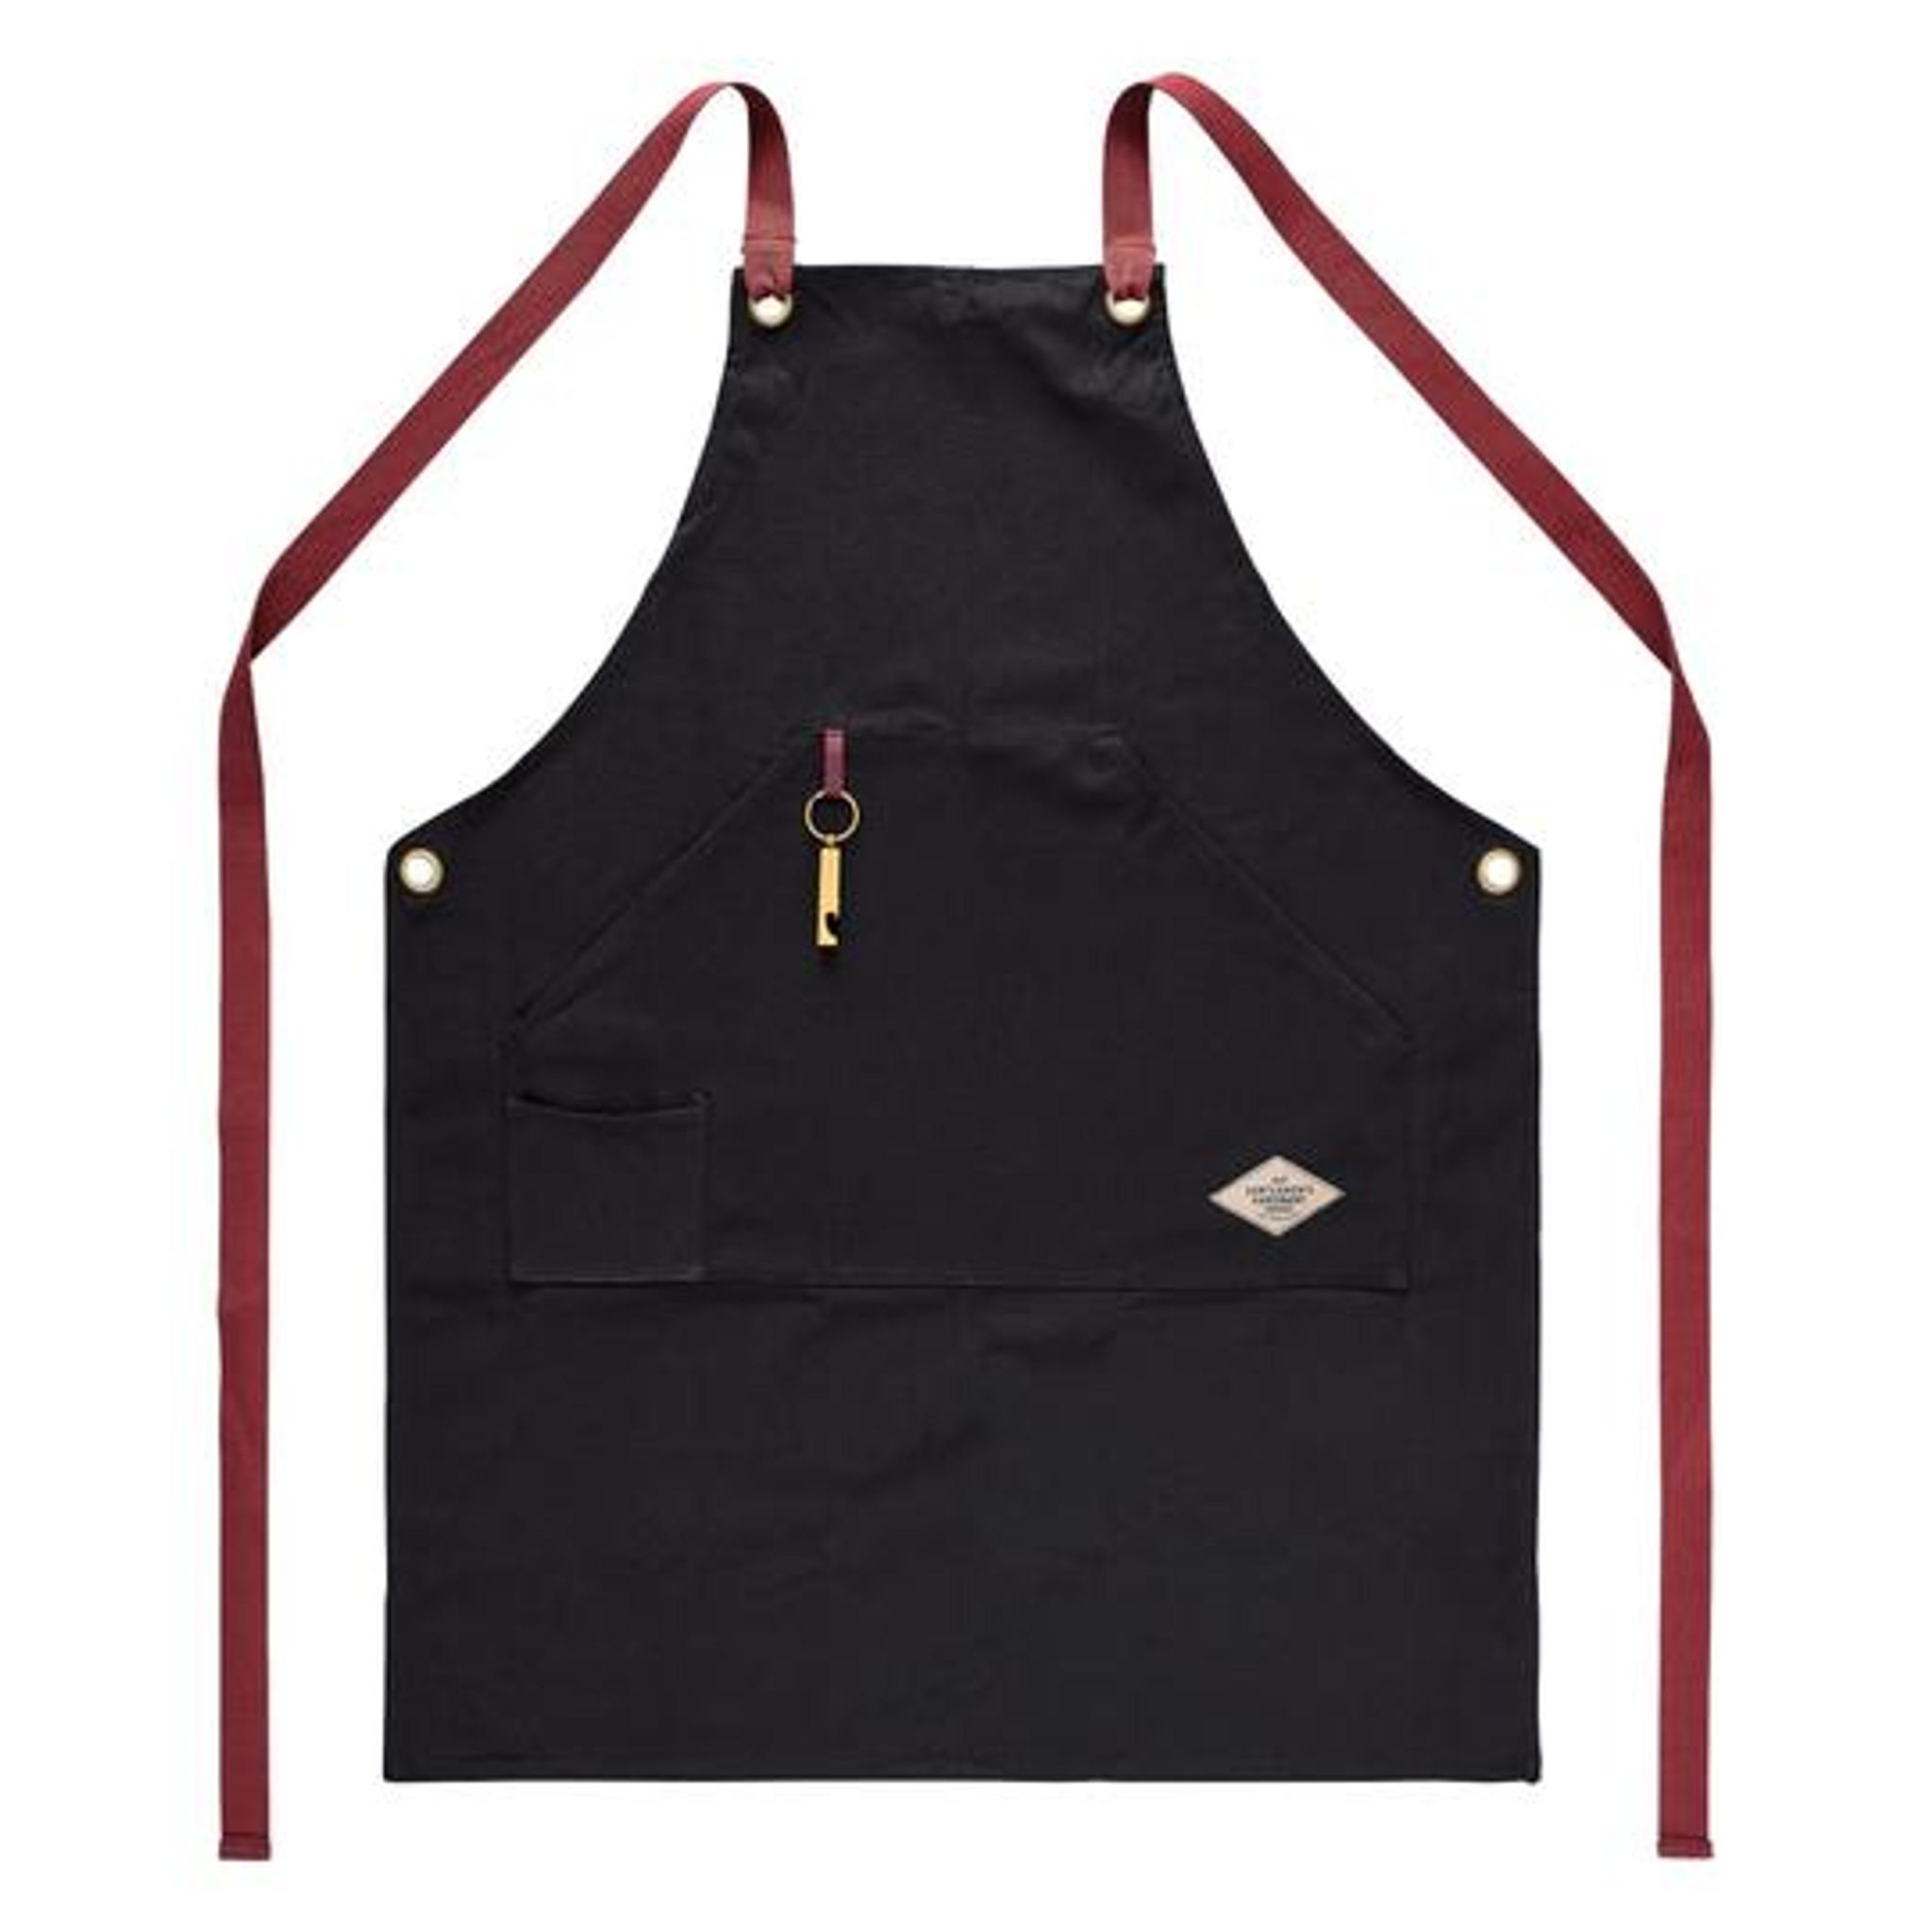 Gentleman's Hardware - BBQ Utility Apron & Bottle Opener